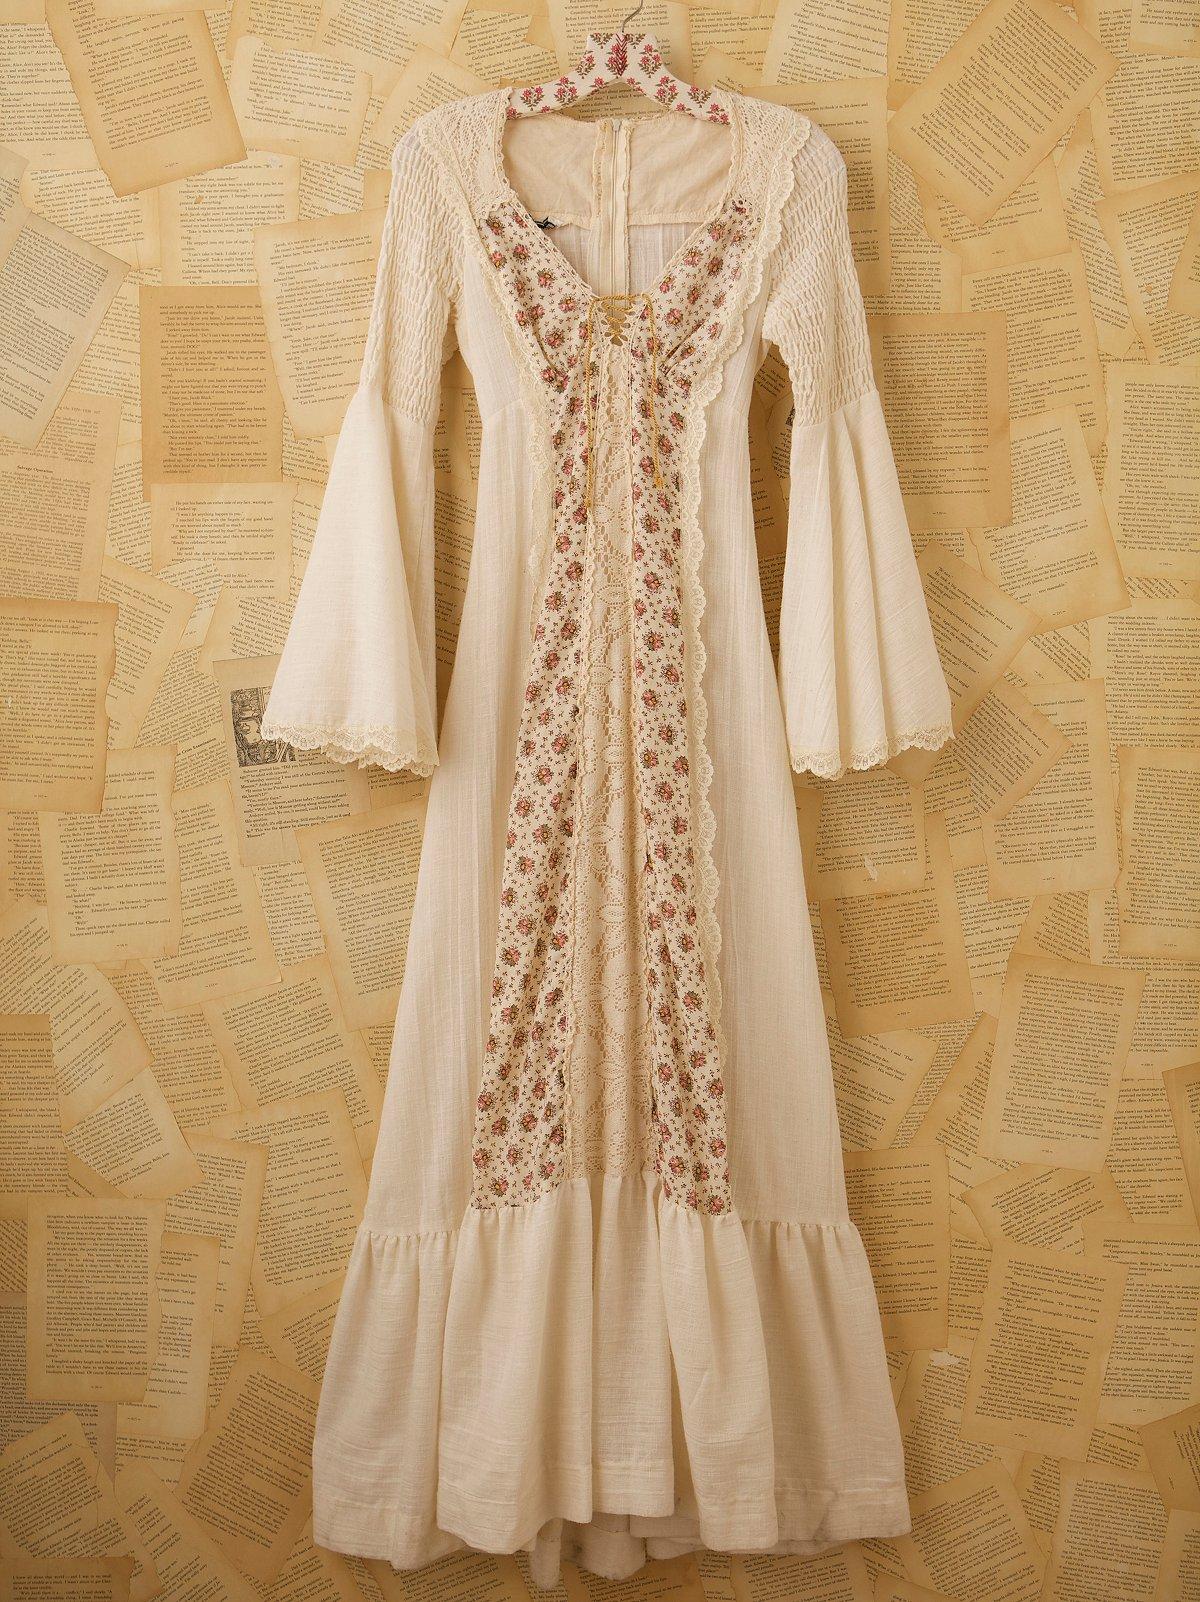 Vintage Joseph Magnin Dress